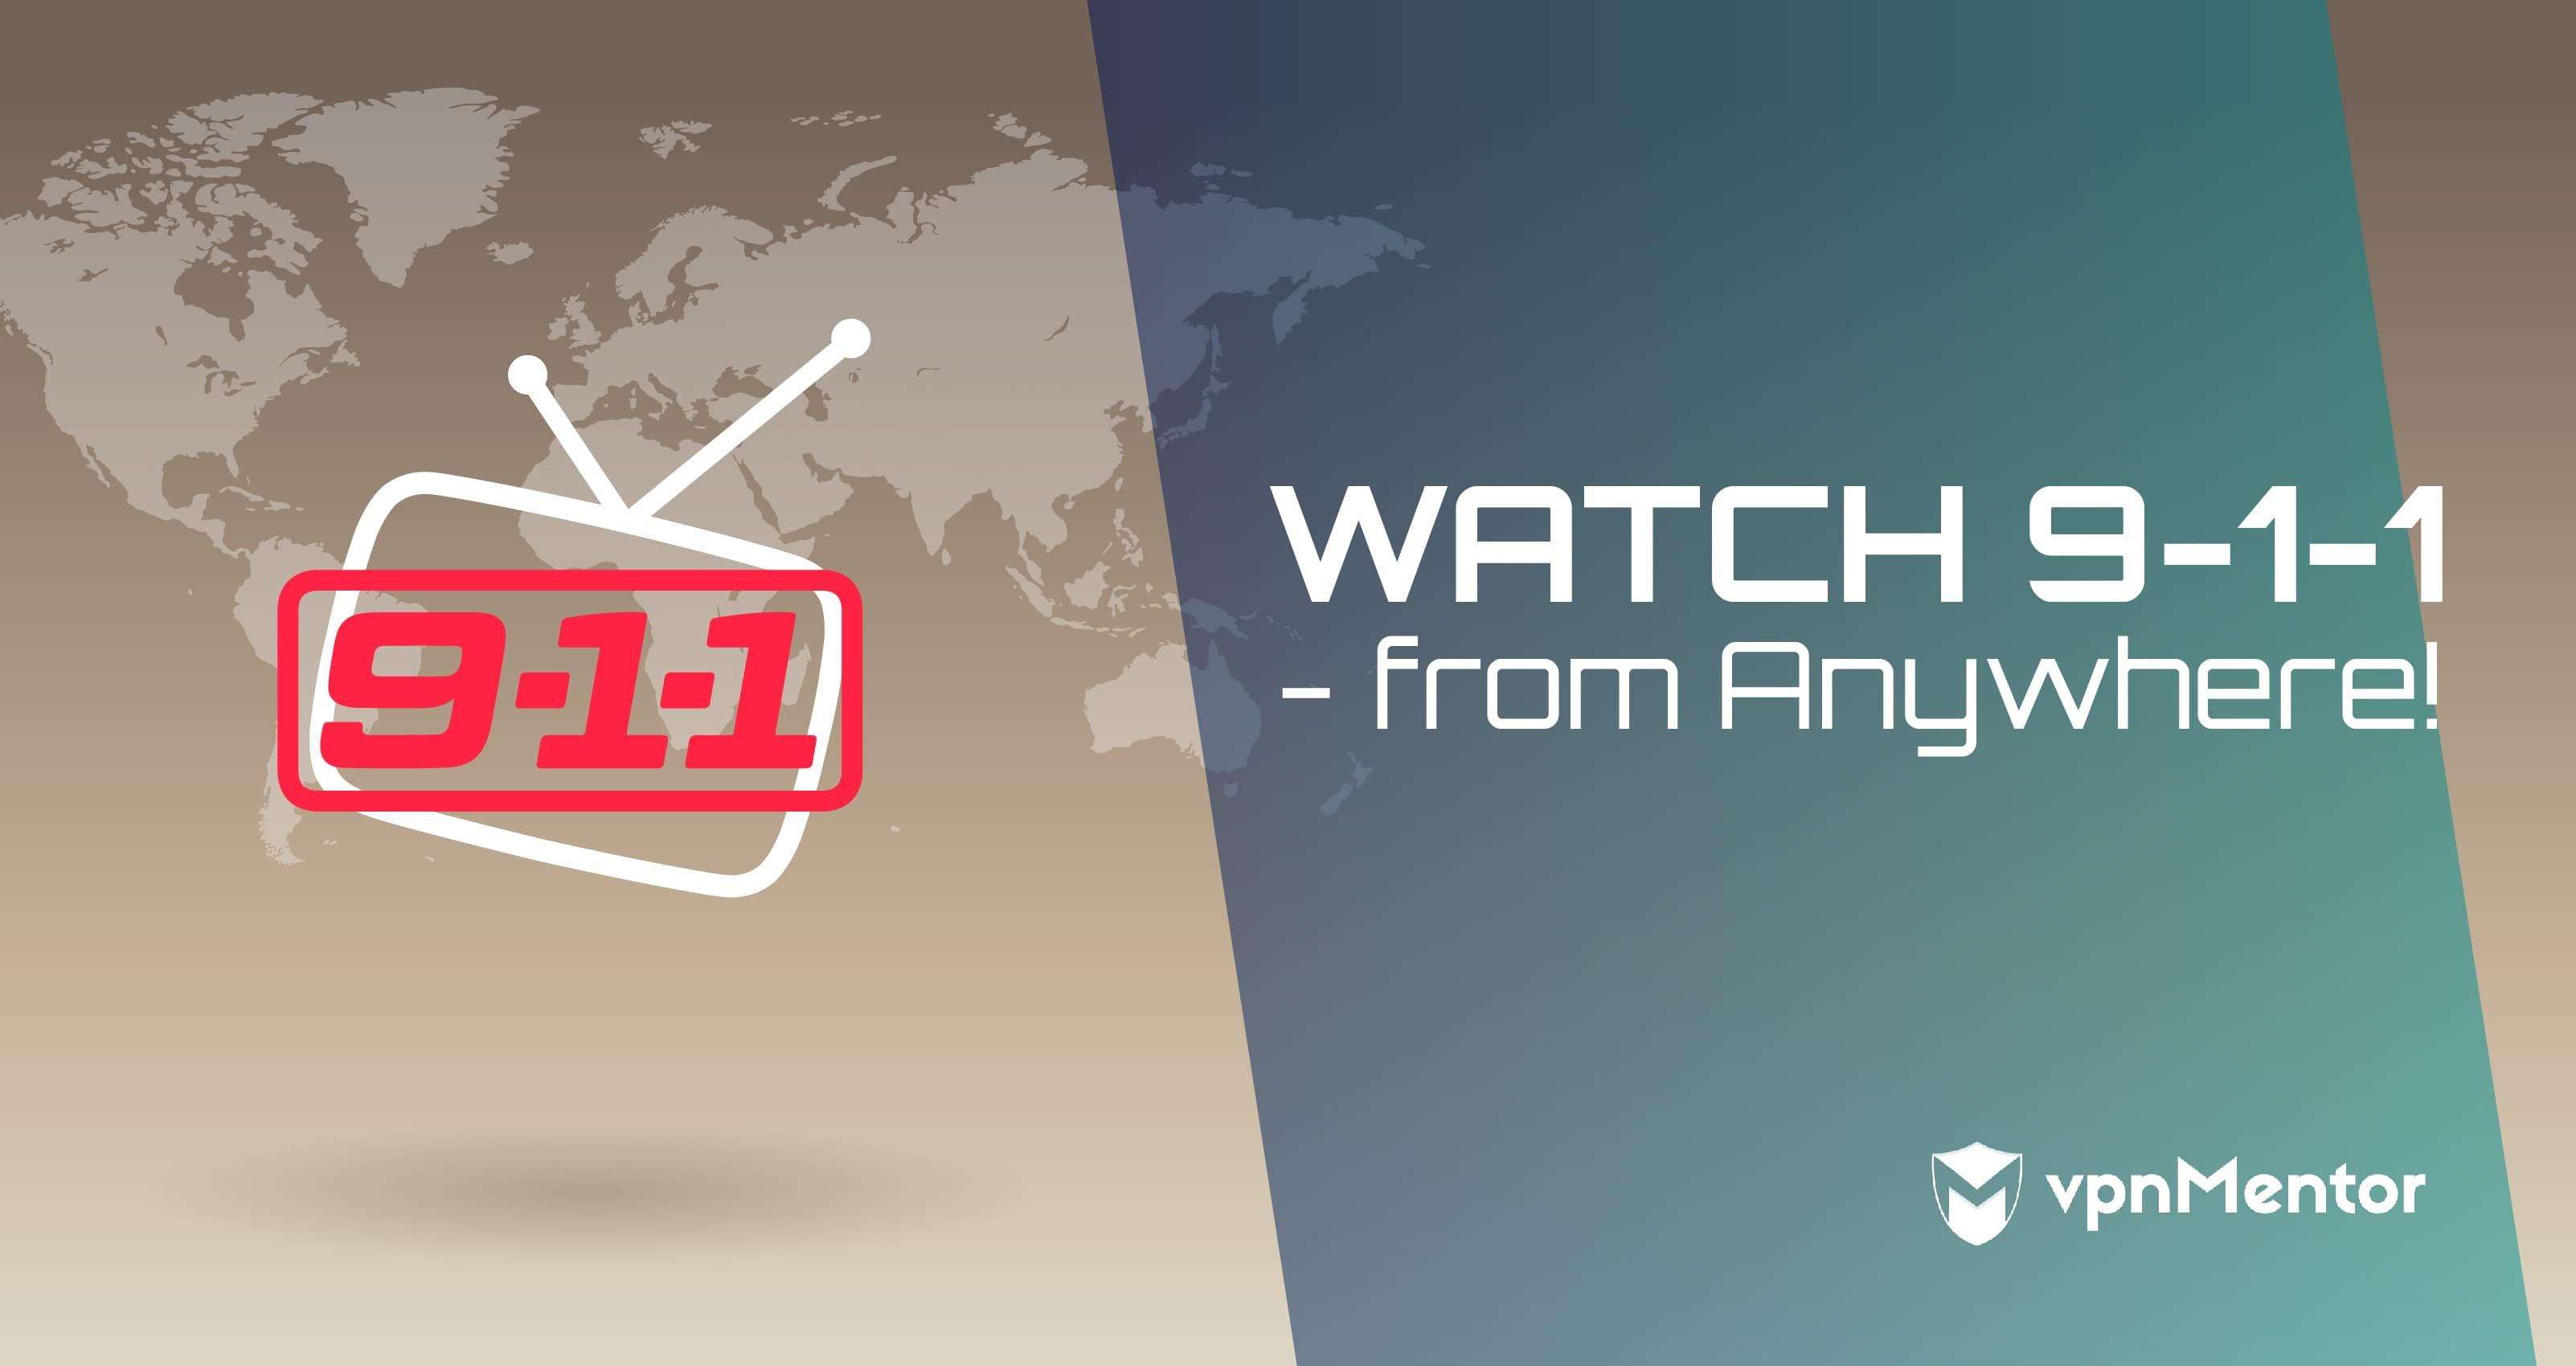 Watch 9-1-1 Anywhere